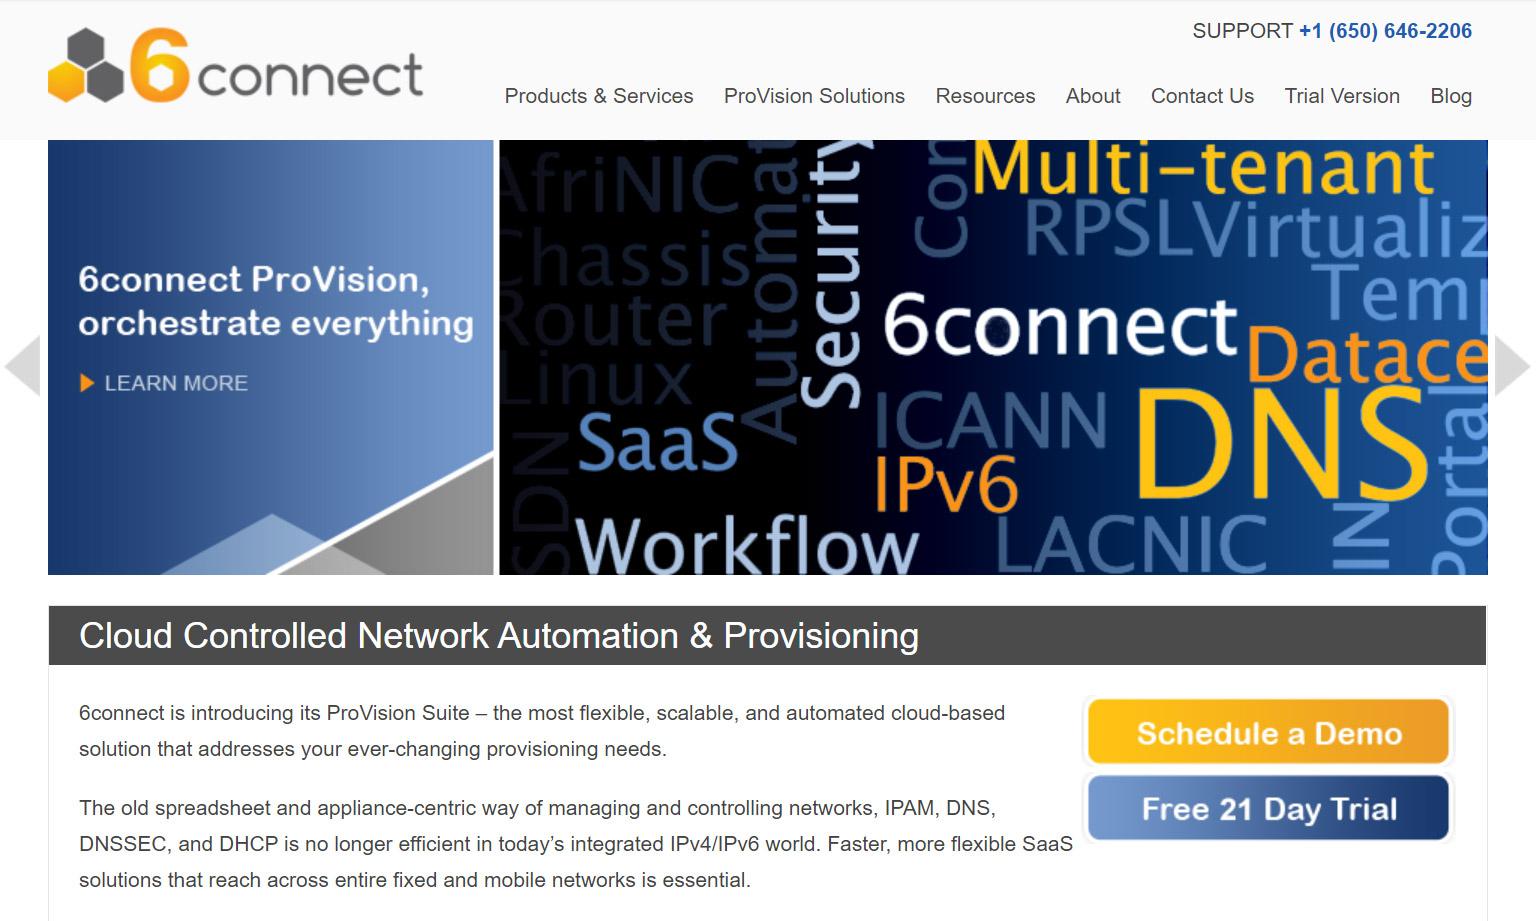 6connect website screenshot from 2013